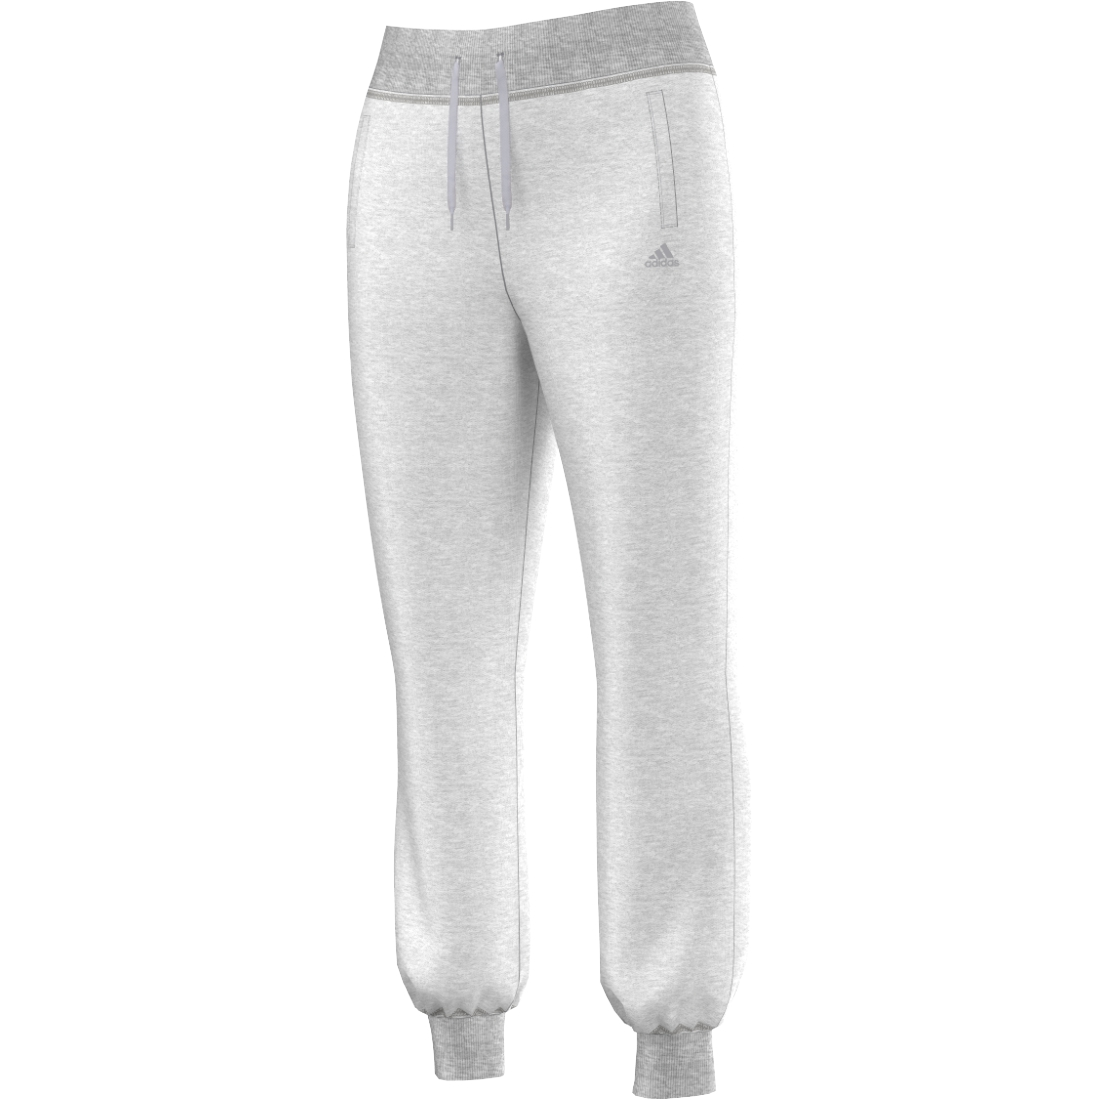 Image of   Adidas Essentials Cuffed Pant